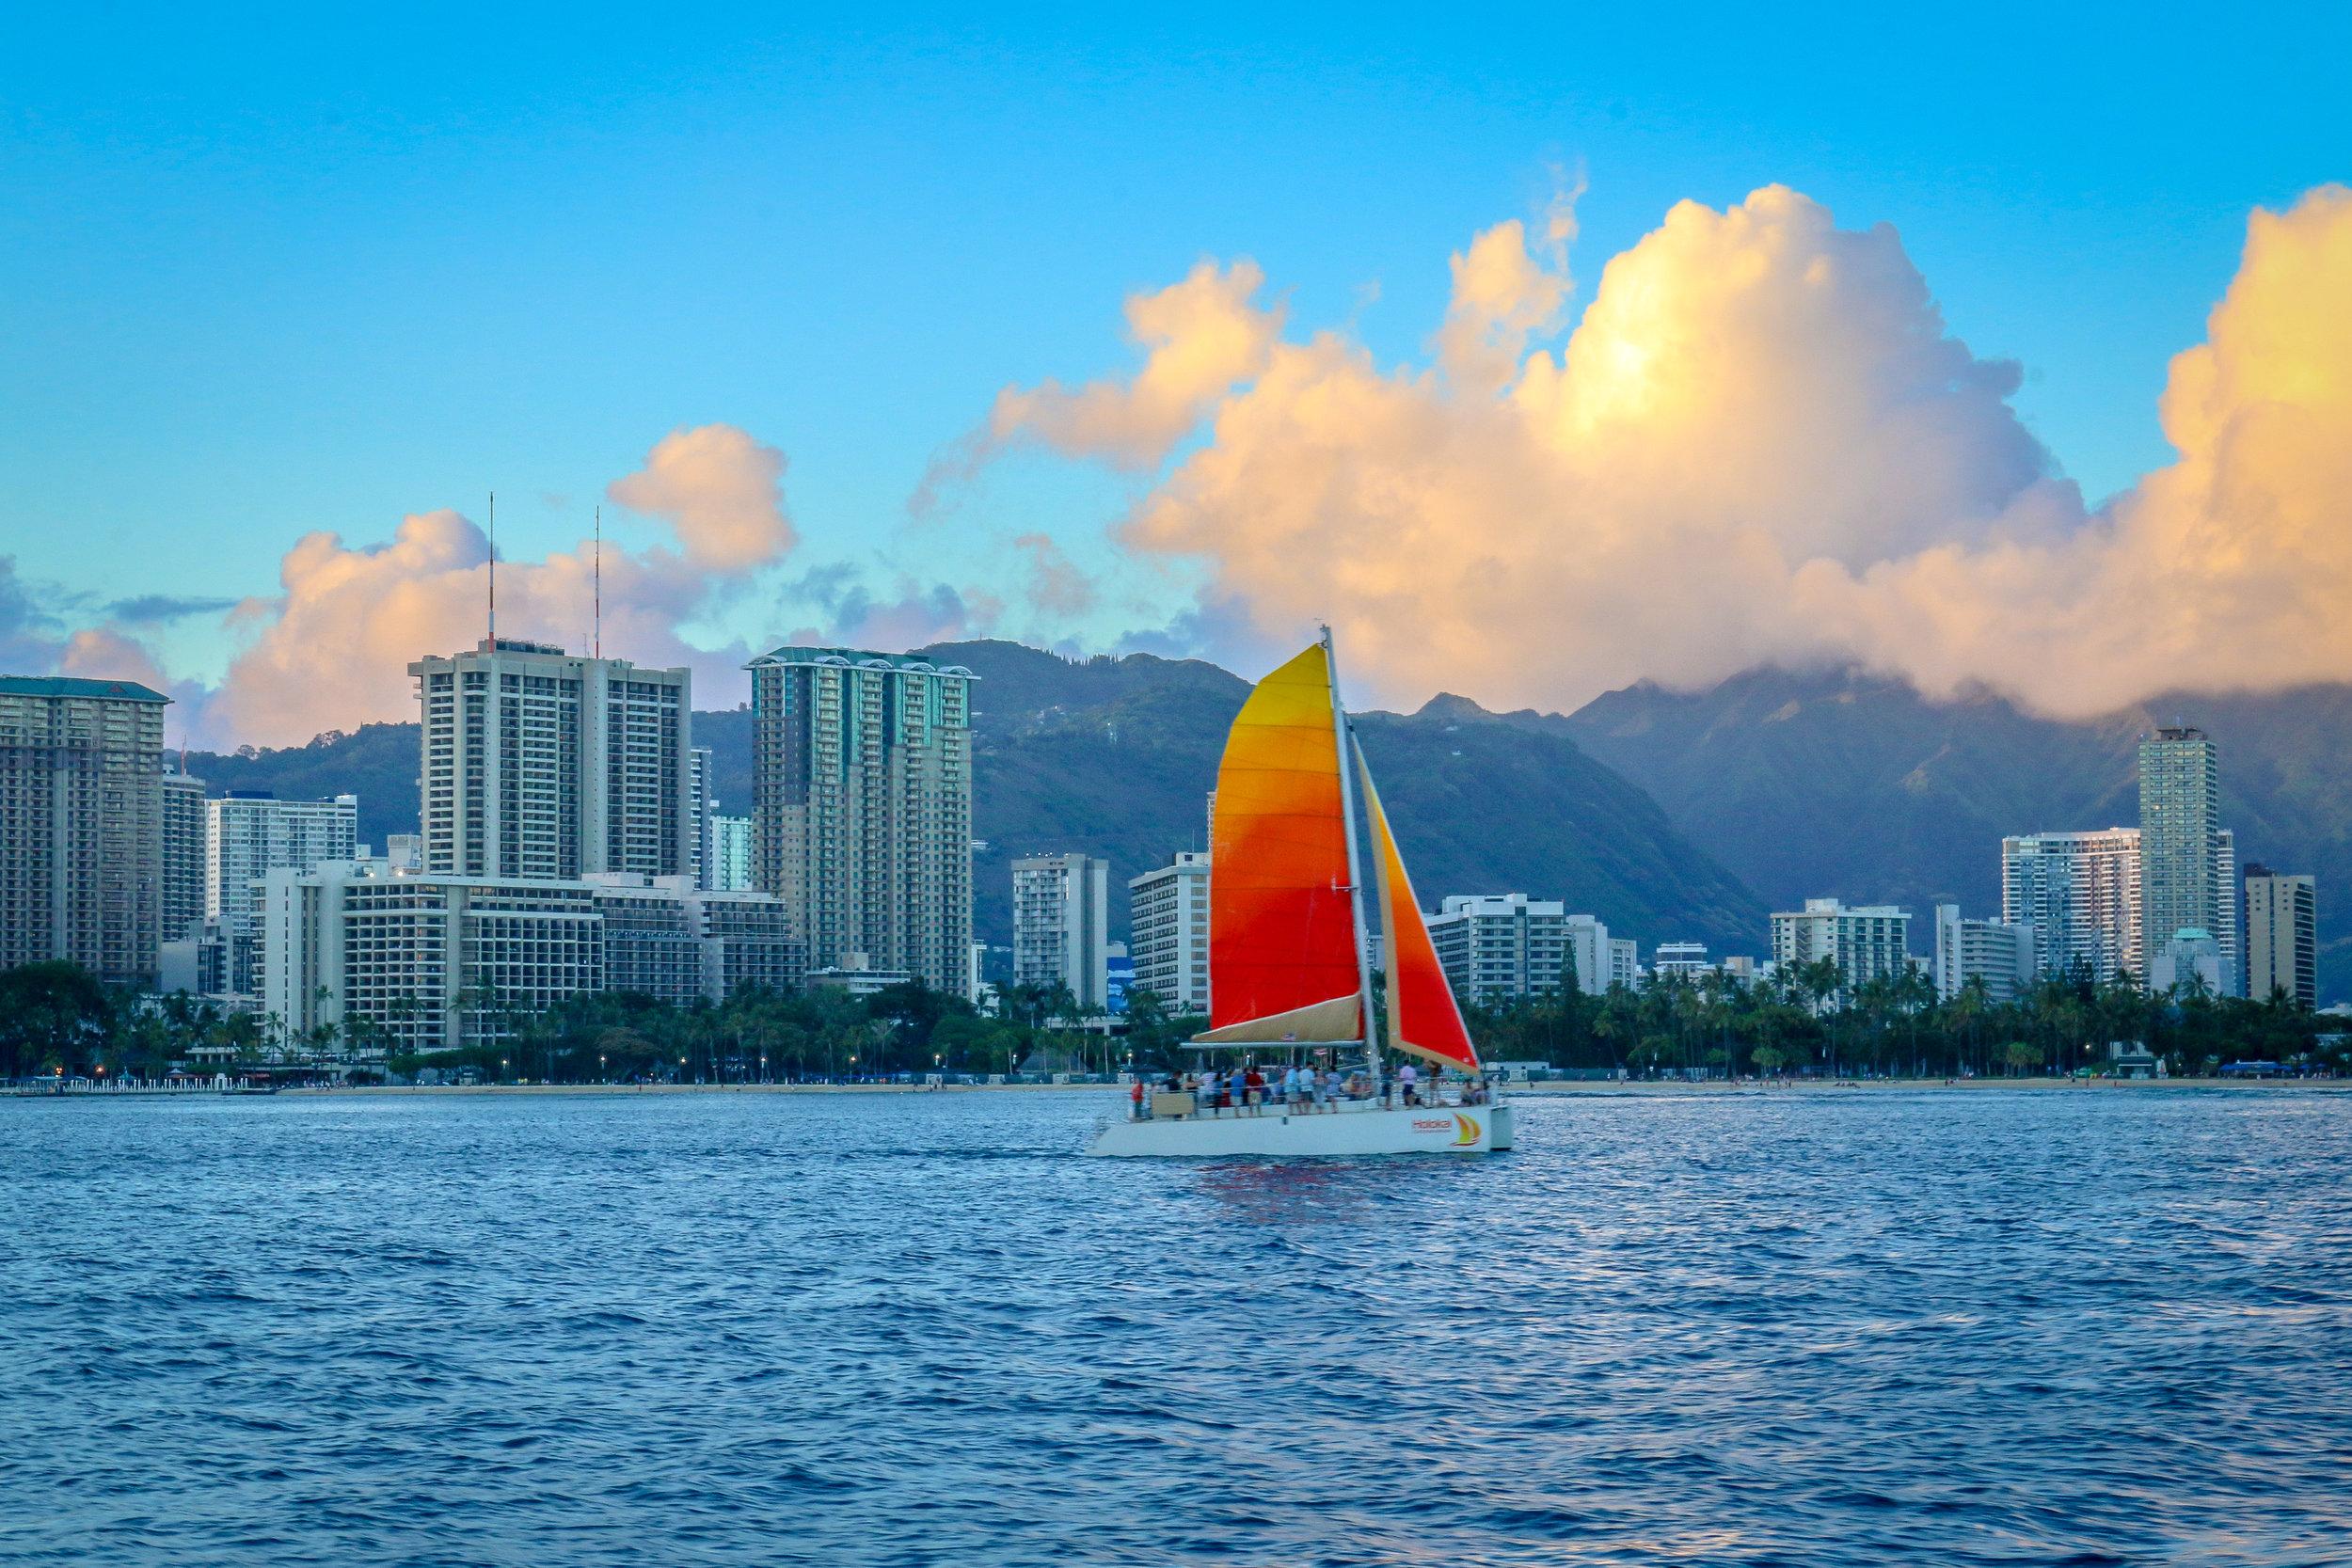 Oahu Hawaii HI photos photography Waikiki Honolulu